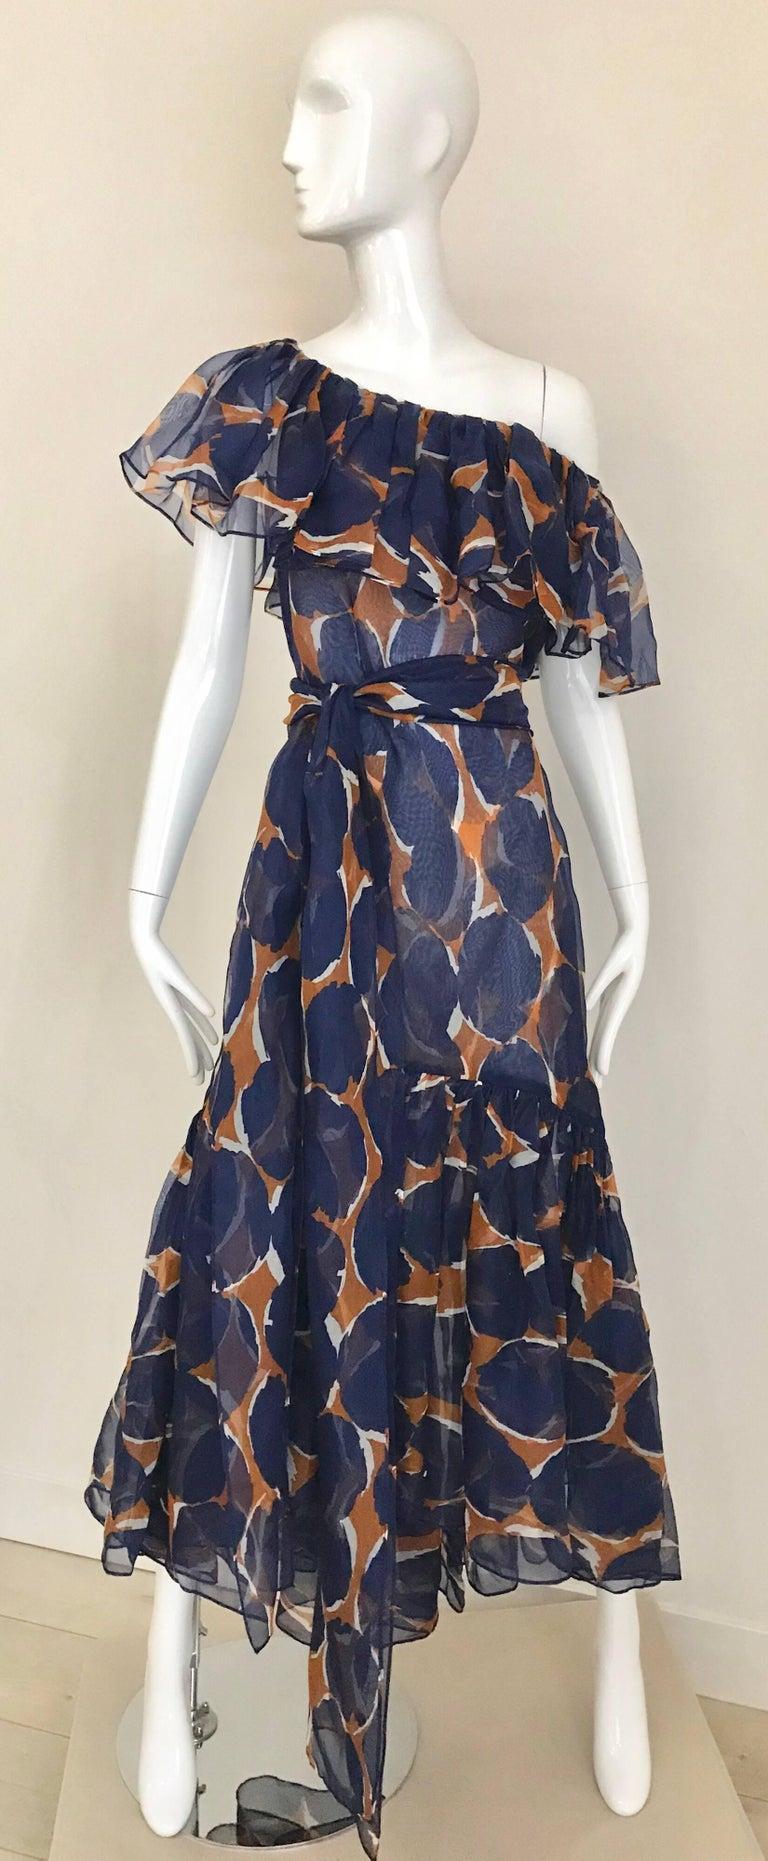 Vintage Yves Saint Laurent Blue and Brown Print Flamenco Style Silk Dress 9